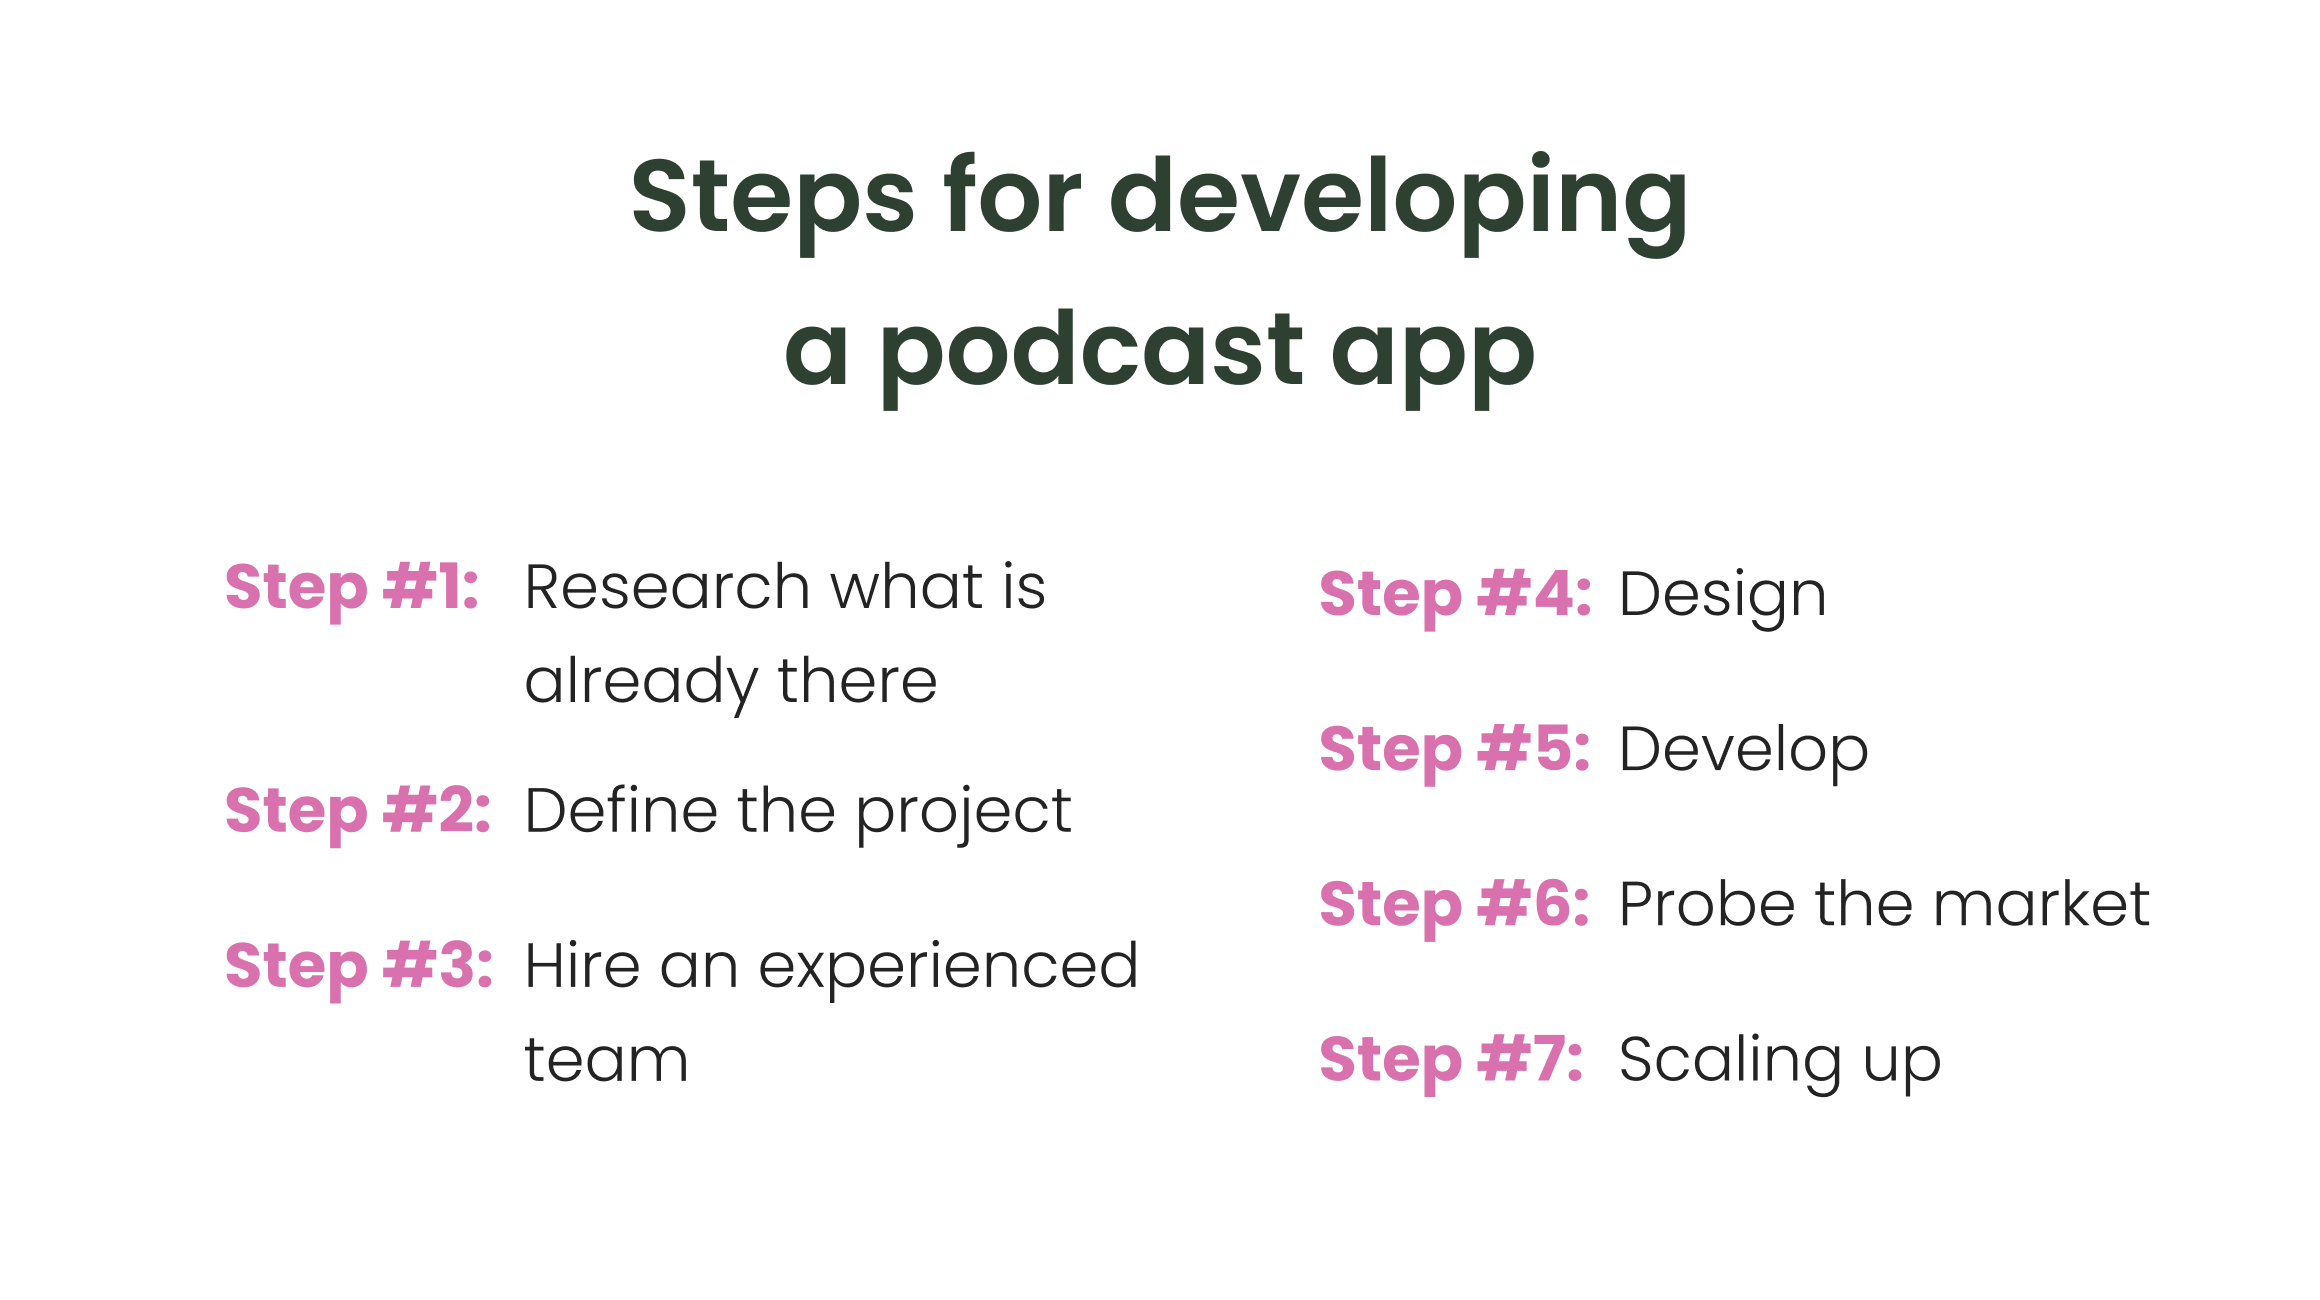 https://images.ctfassets.net/0nm5vlv2ad7a/2GTVDEeLzkCxXuKbilfwcb/6ec2bcd85030a0b59cb4e11839243770/steps_to_develop_a_podcast_app.png